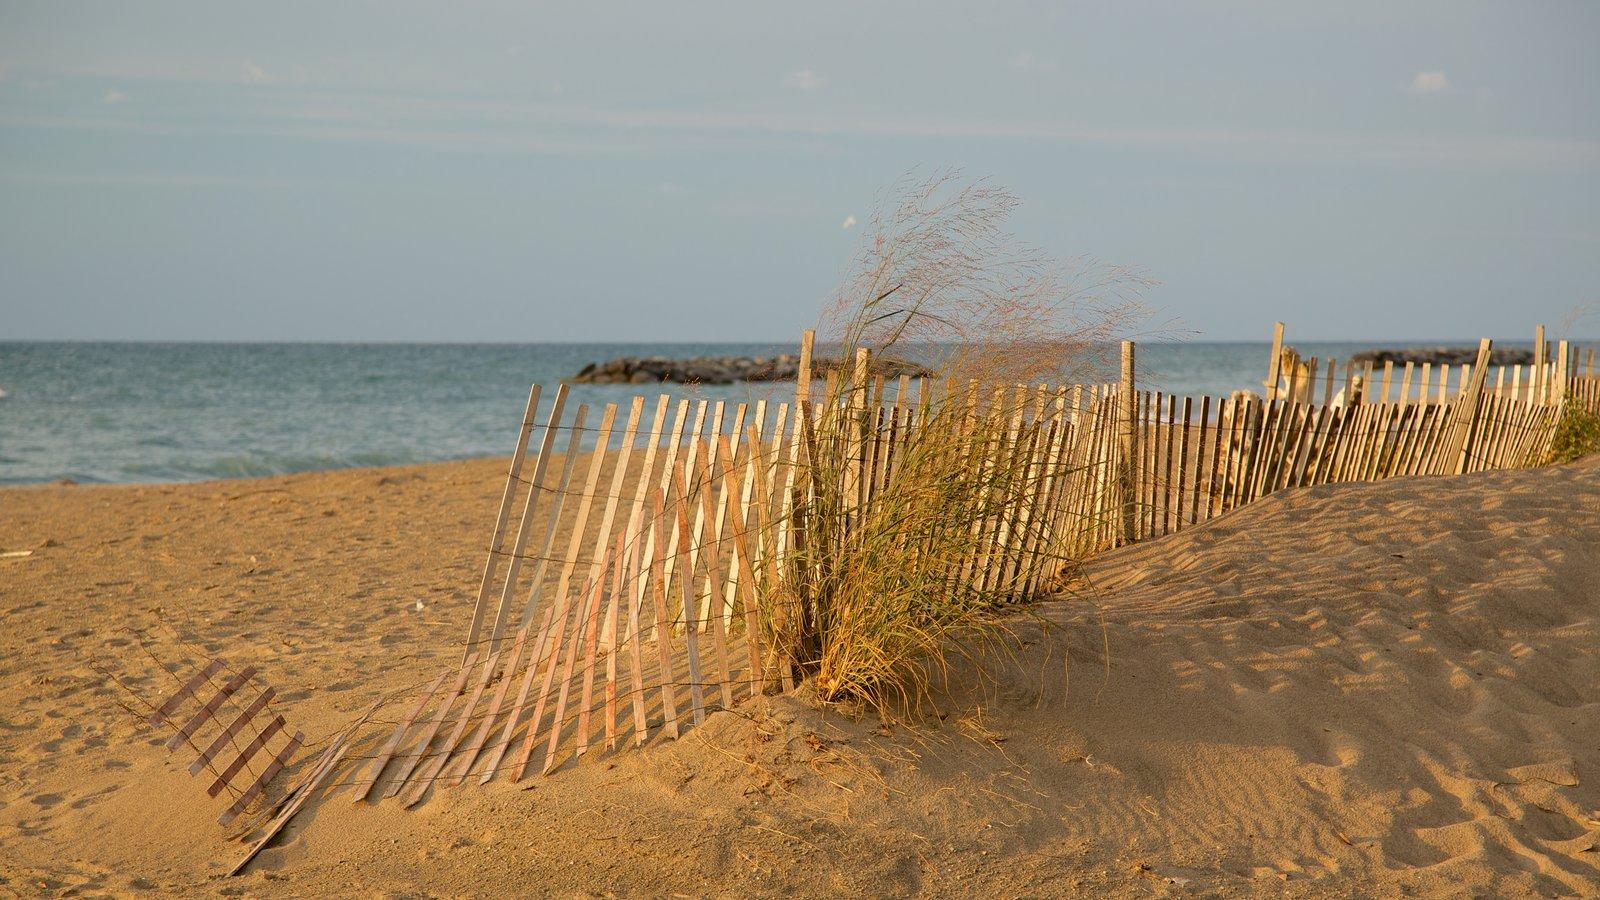 Erie caracterizando uma praia